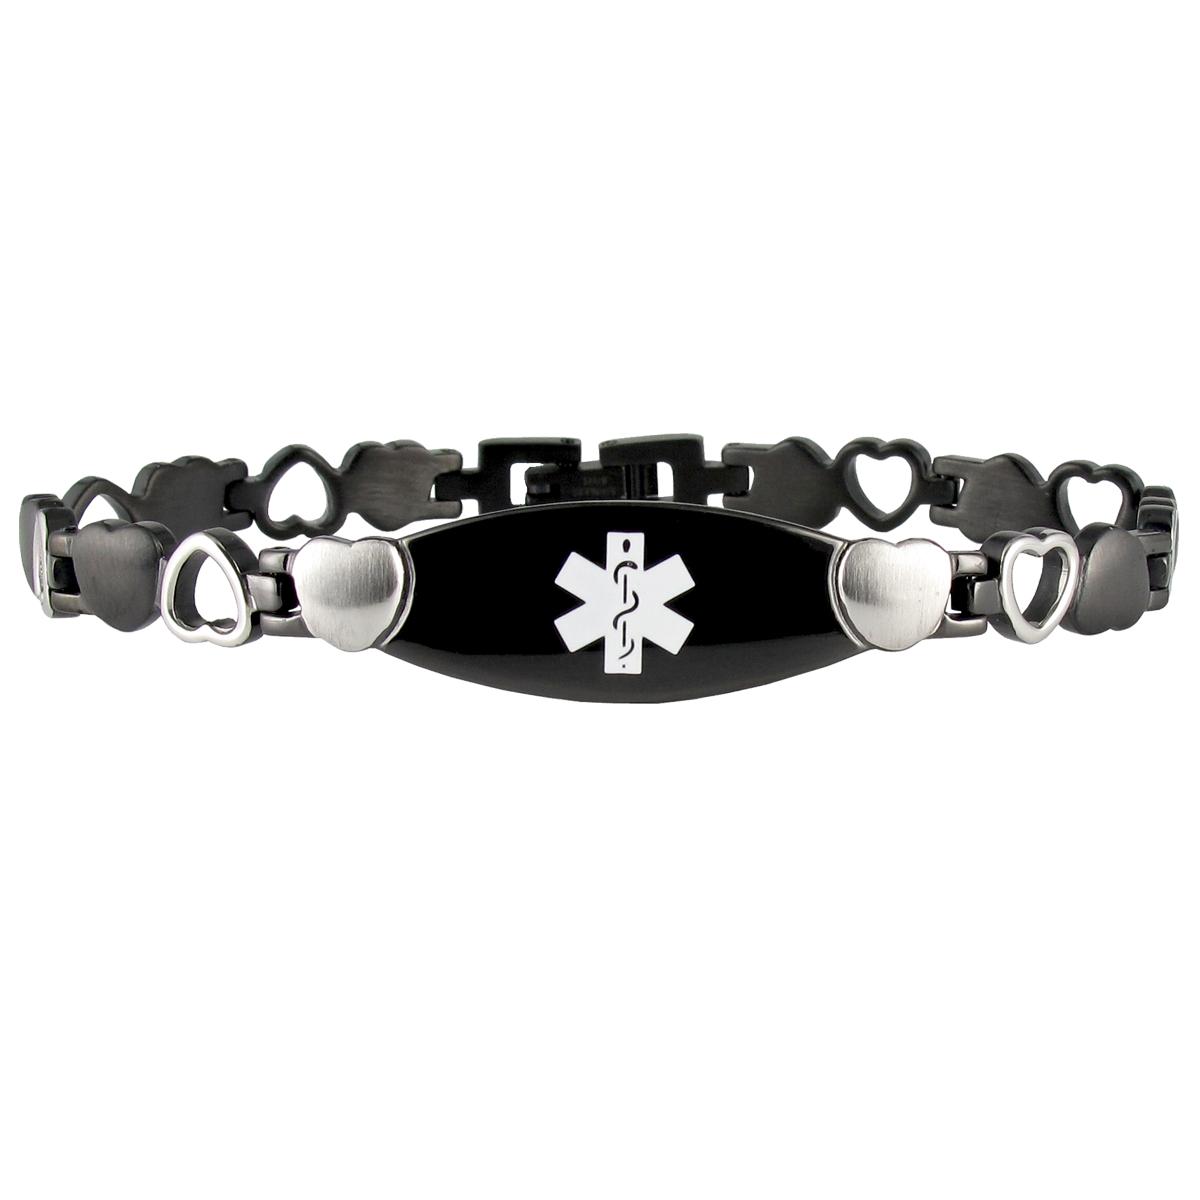 Eternity Bracelet Medical Bracelet Alert Bracelet Medical Id Bracelets